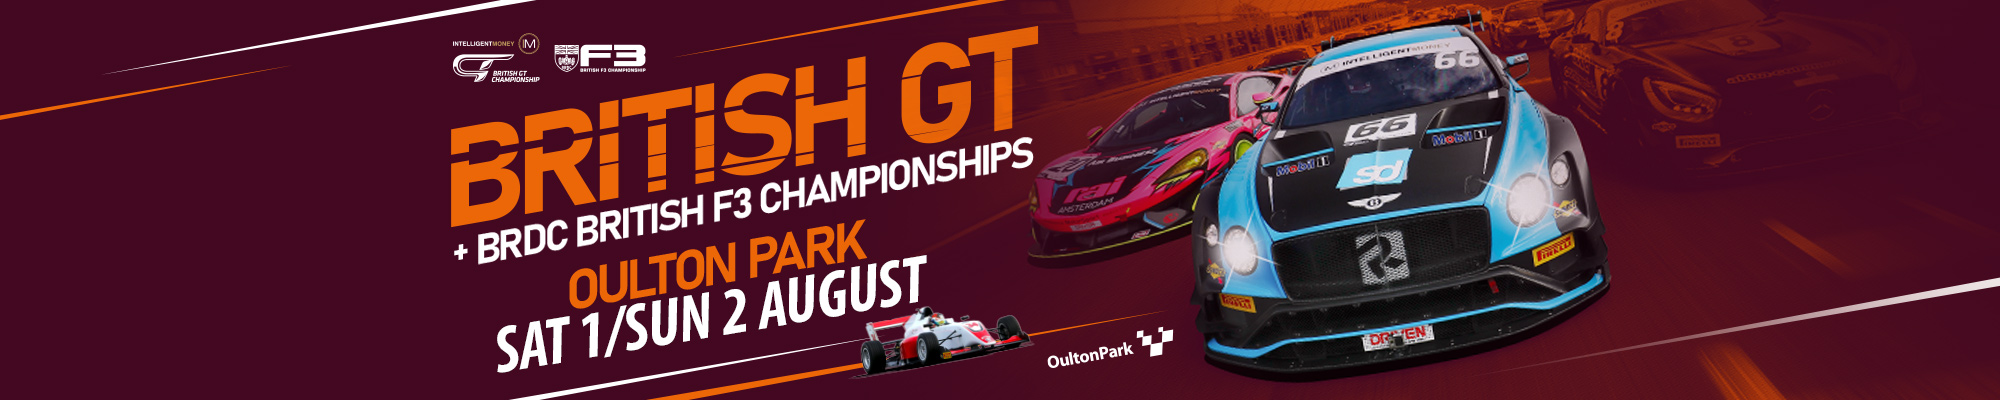 British GT & British F3 Championships - POSTPONED